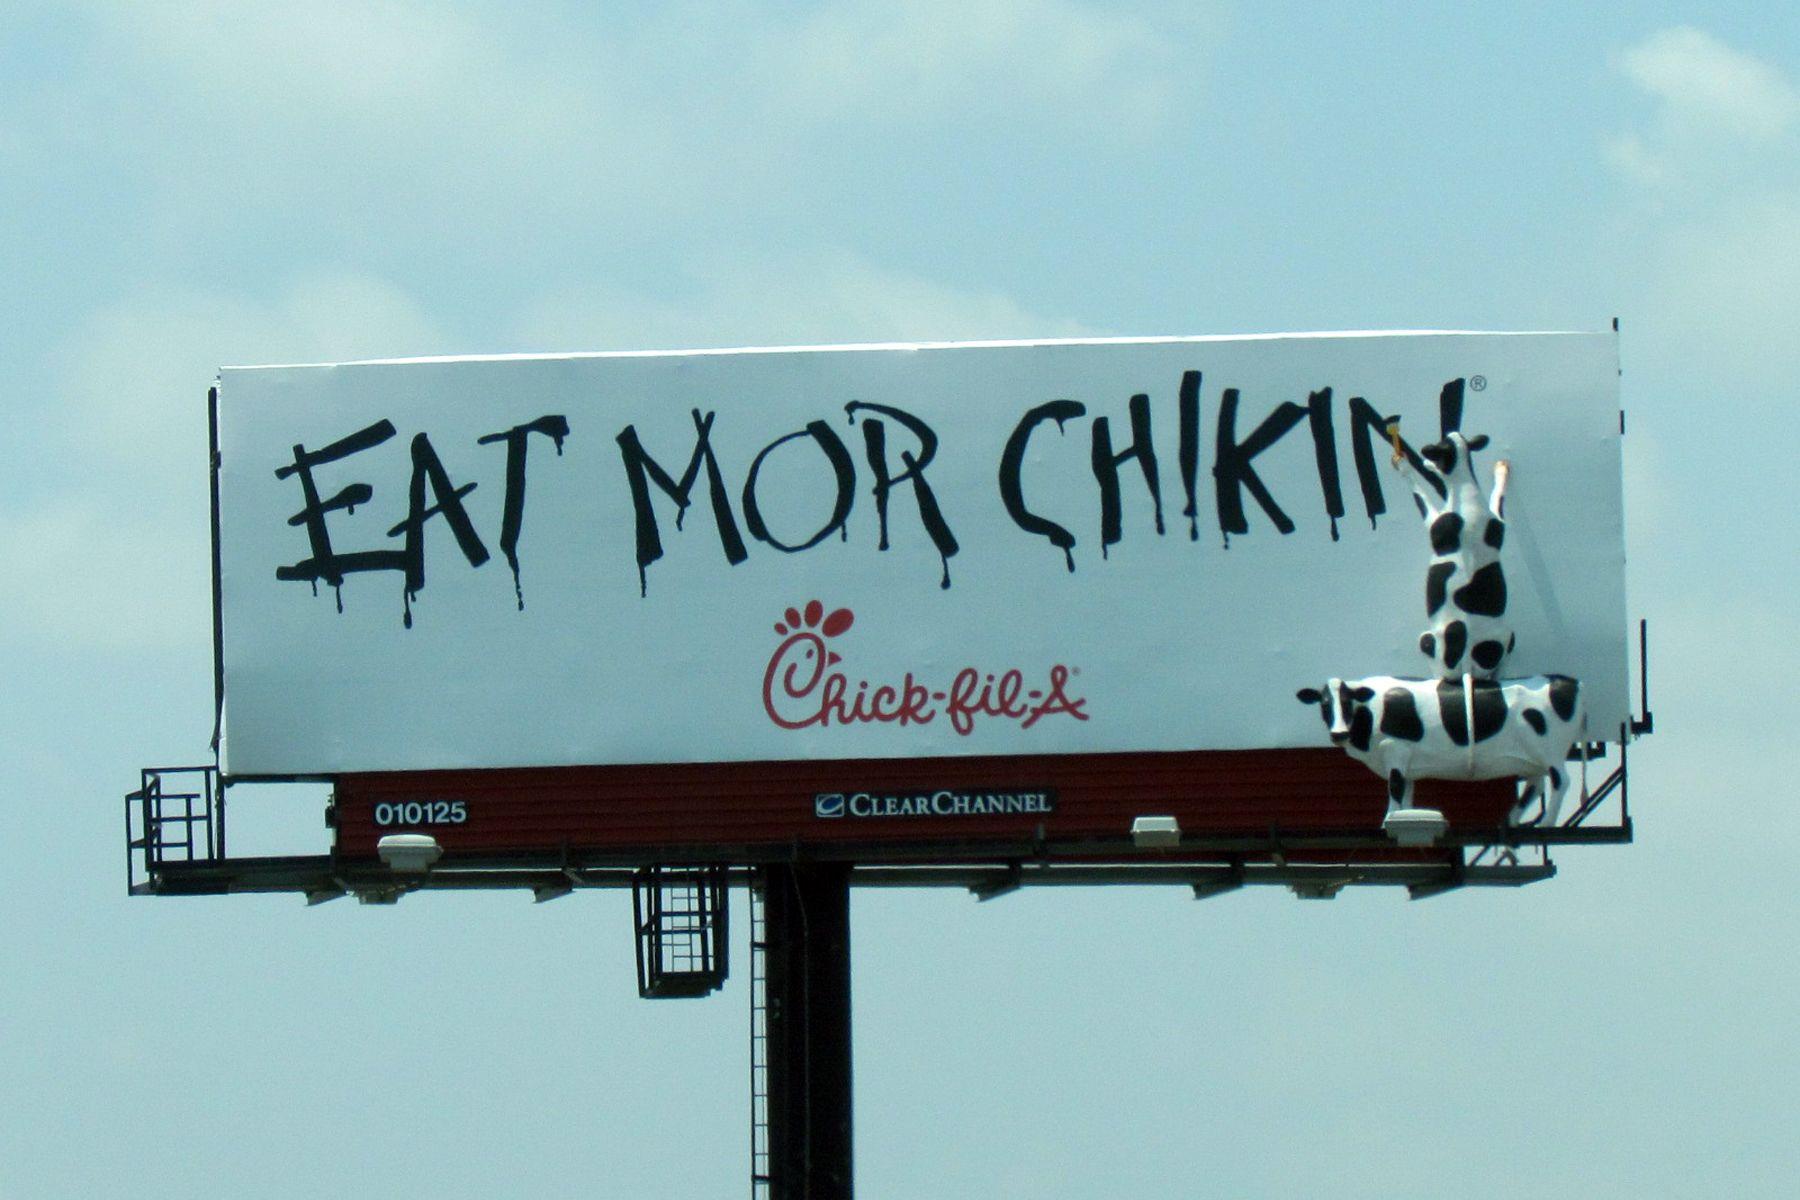 Eat more chicken! ChickFilA Eat more chicken, Chicken